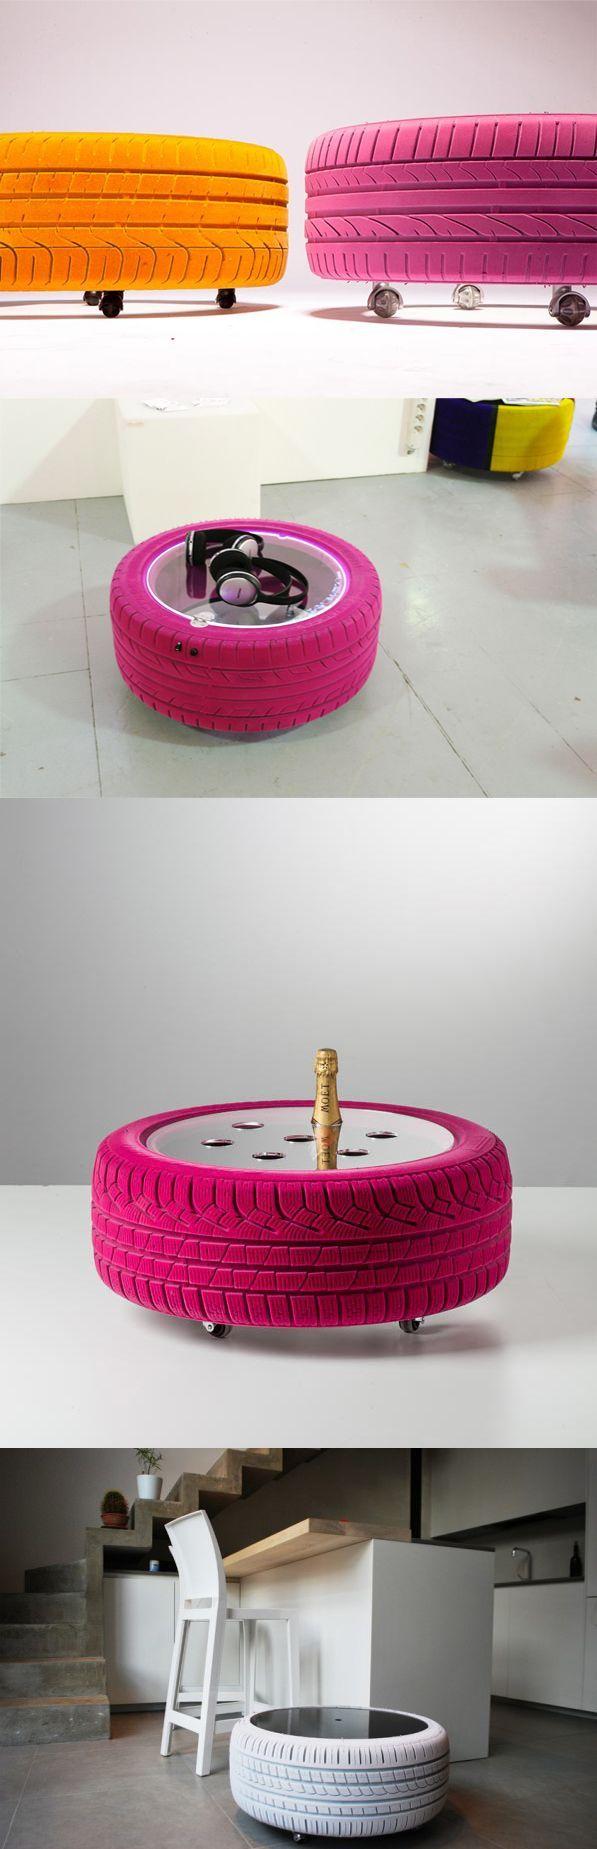 Mesita reutilizando un neumático - Muy Ingenioso